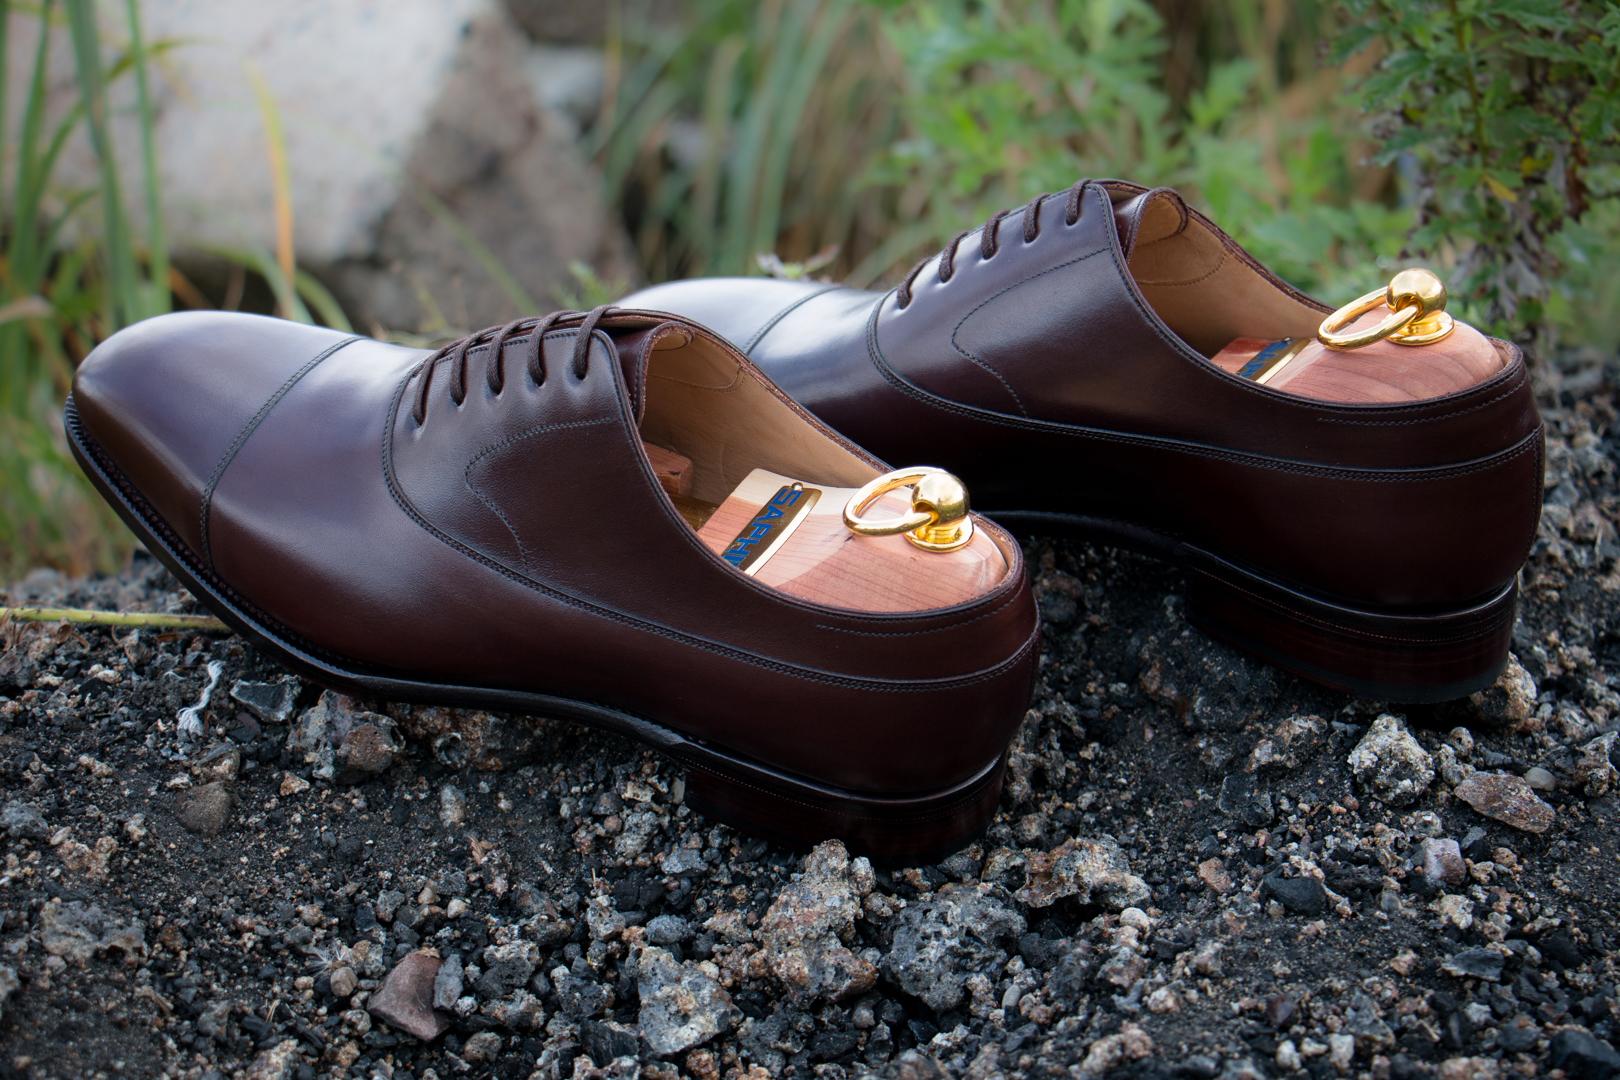 Balmoral Shoes